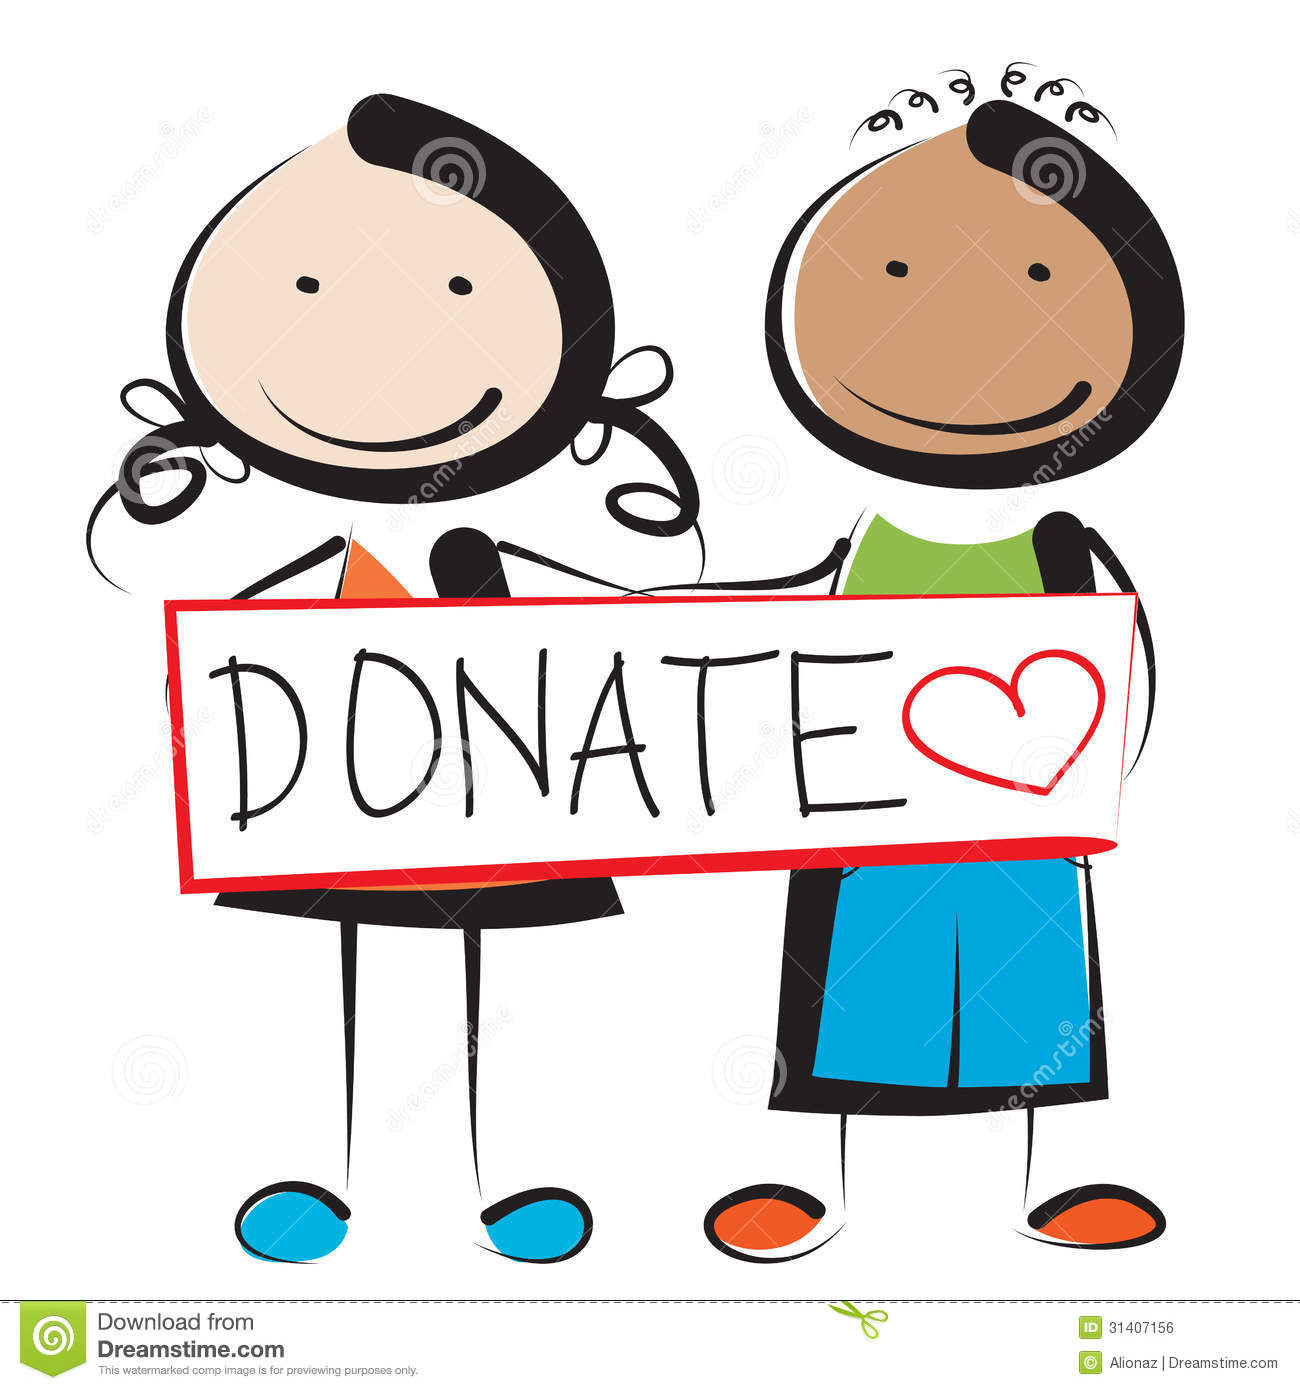 donation-clipart-donate-illustration-children-holding-sign-31407156